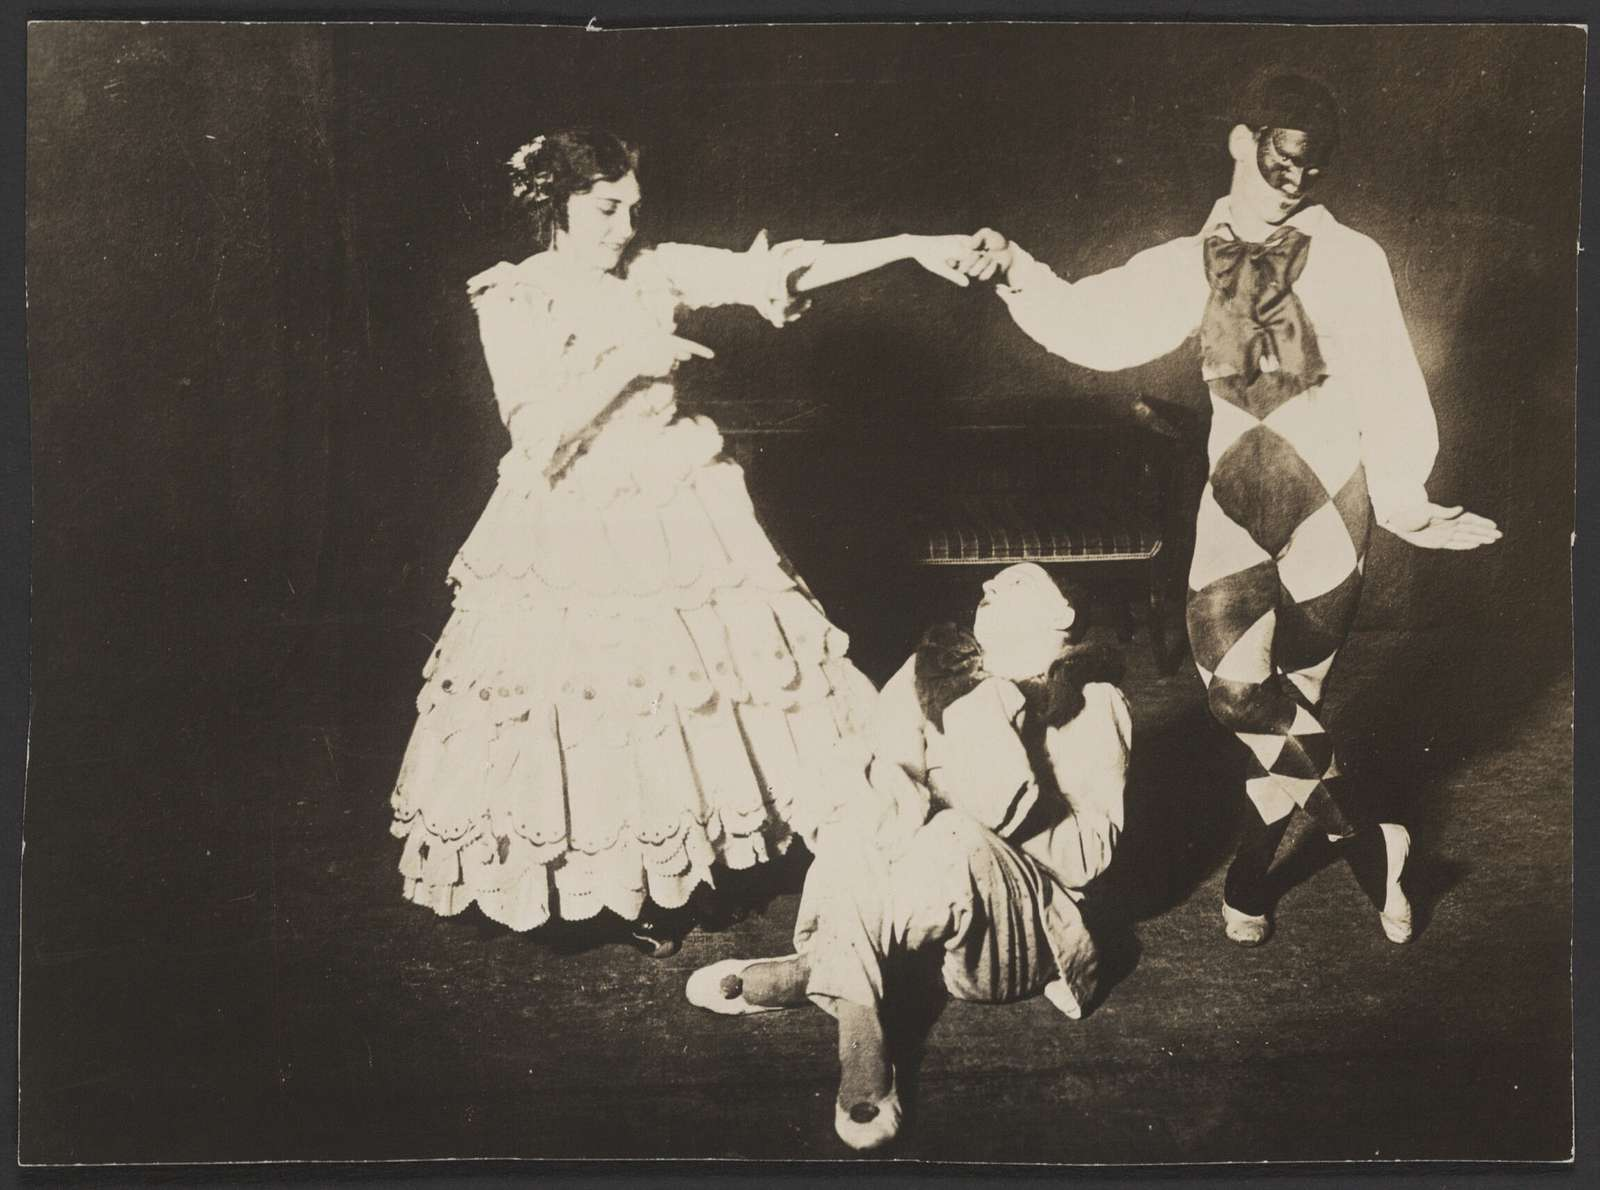 Photograph of Tamara Karsavina, Vaslav Nijinsky, and Adolph Bolm in Le Carnaval, n.d., no photographer